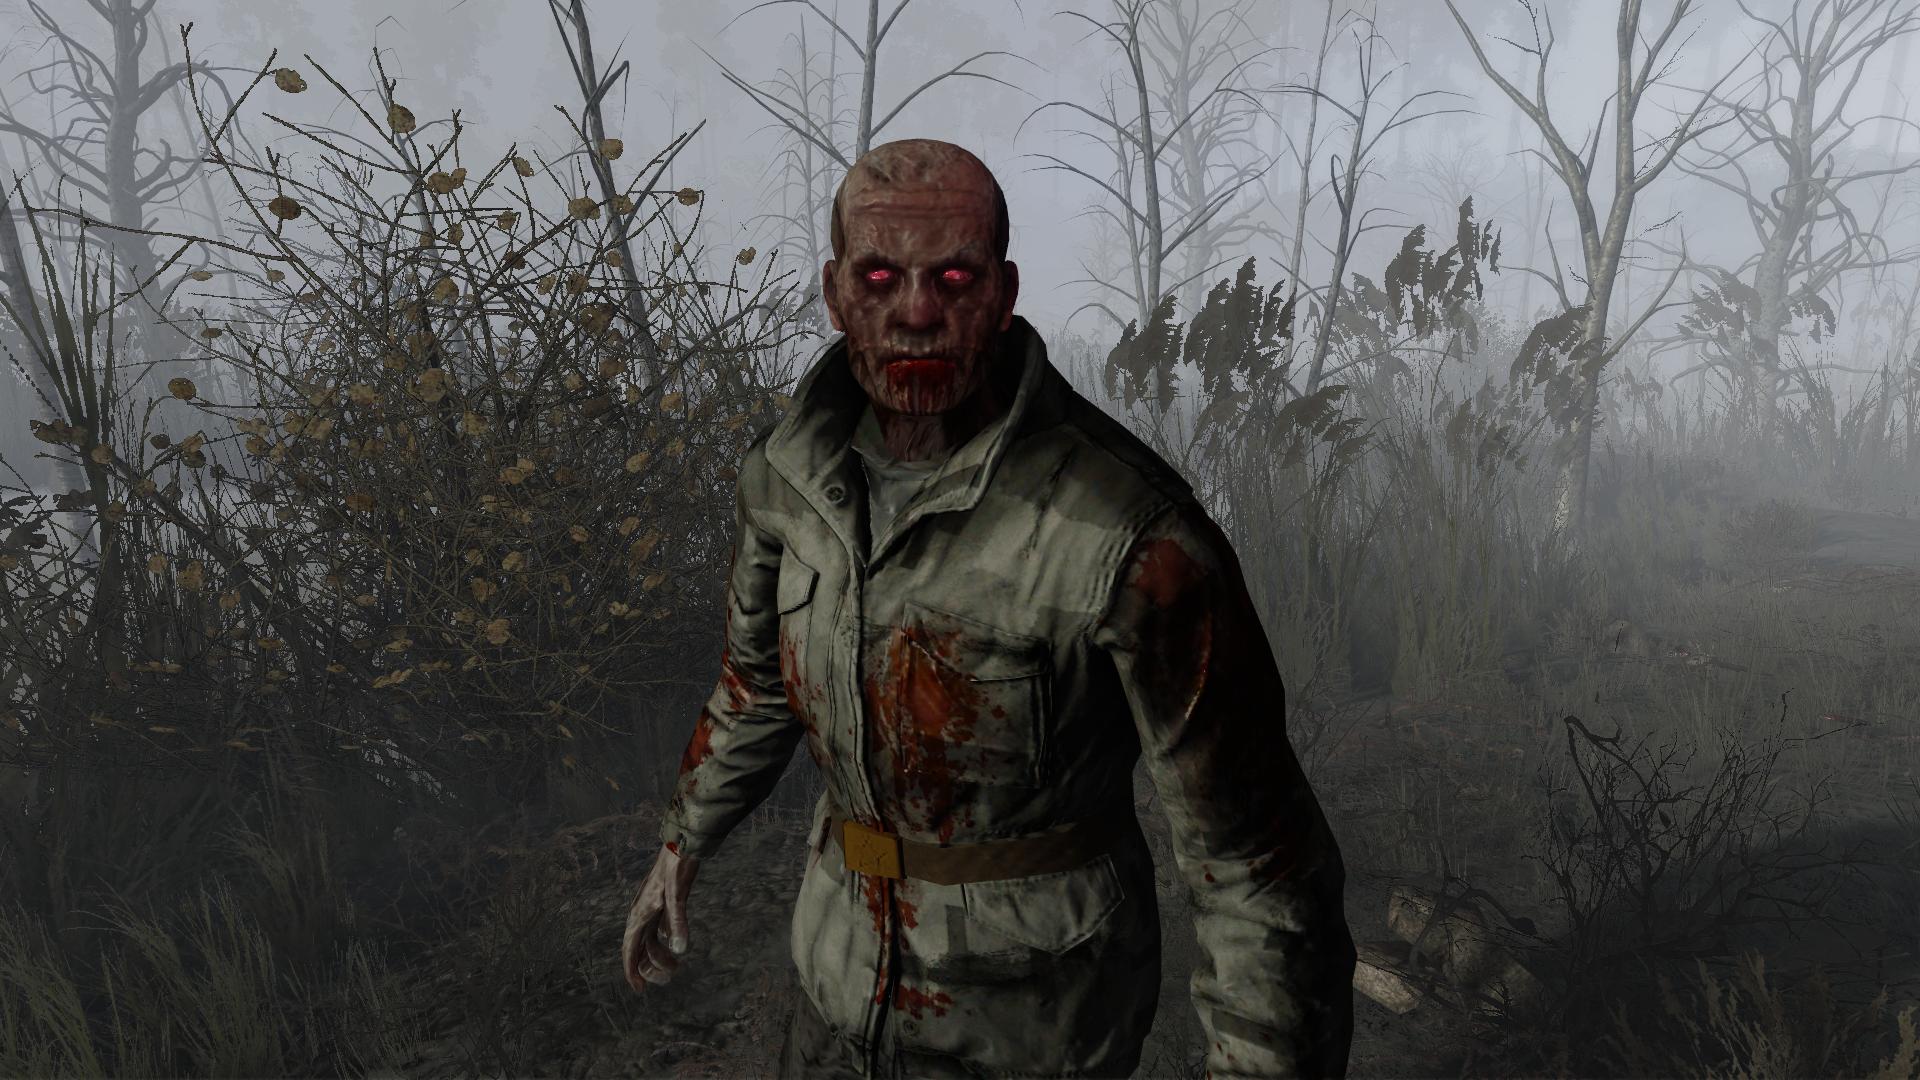 мощь картинки сталкере зомби глядя